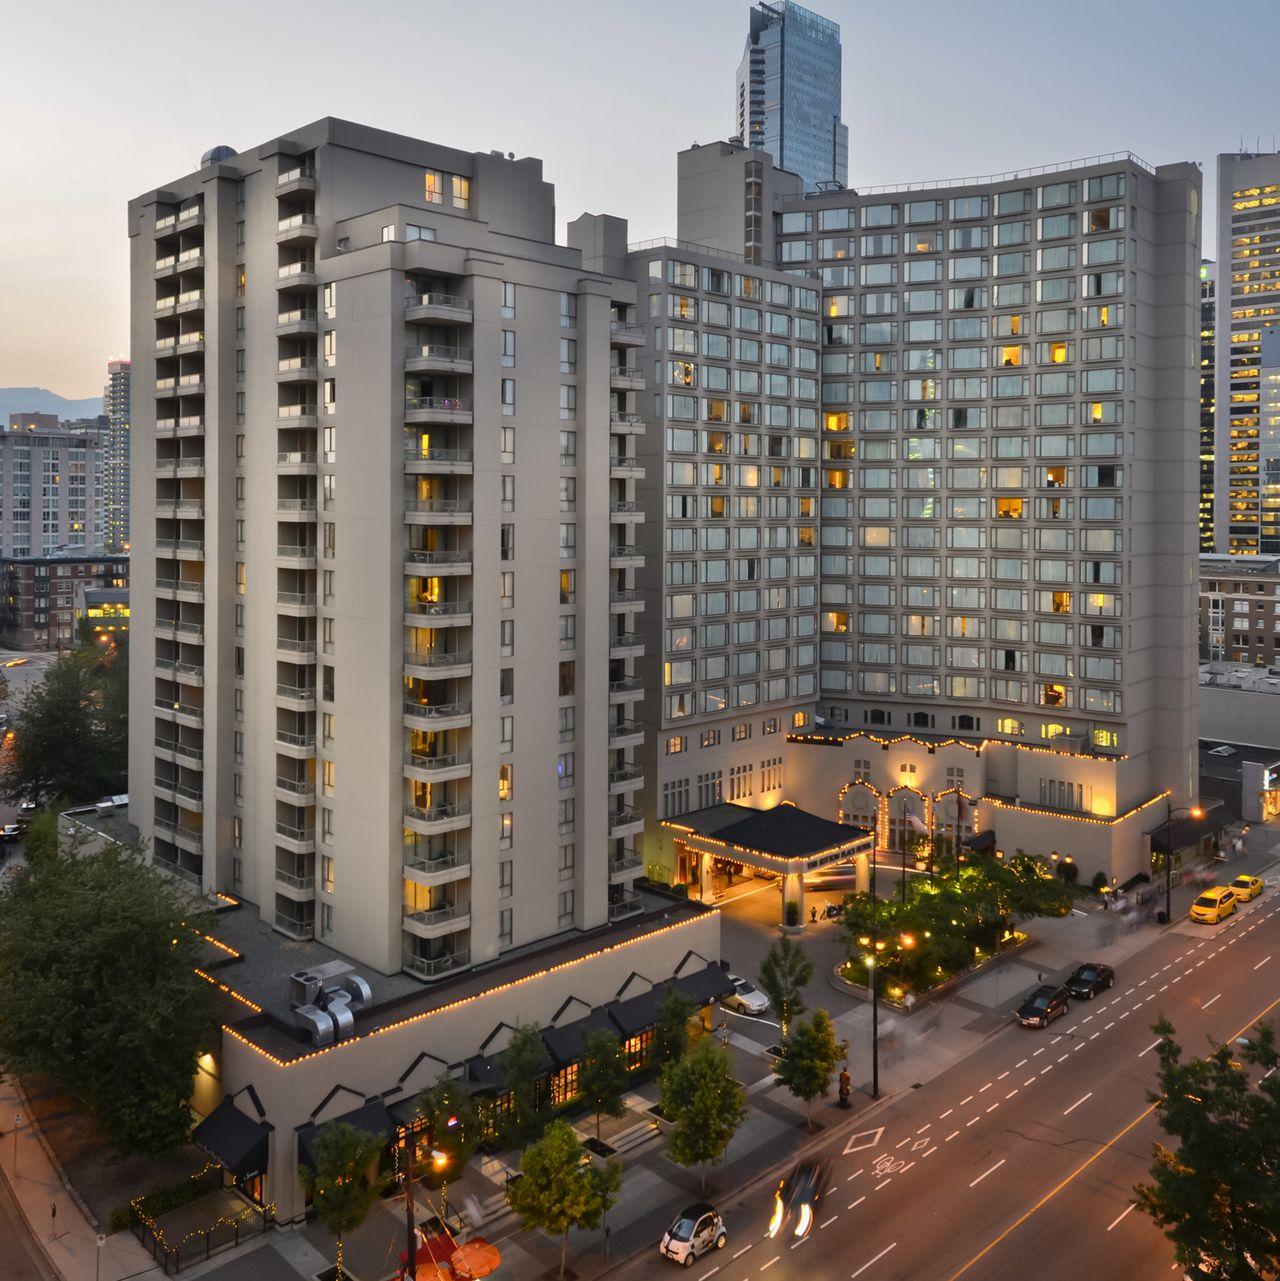 hotel british columbia sutton place hotel canusa. Black Bedroom Furniture Sets. Home Design Ideas